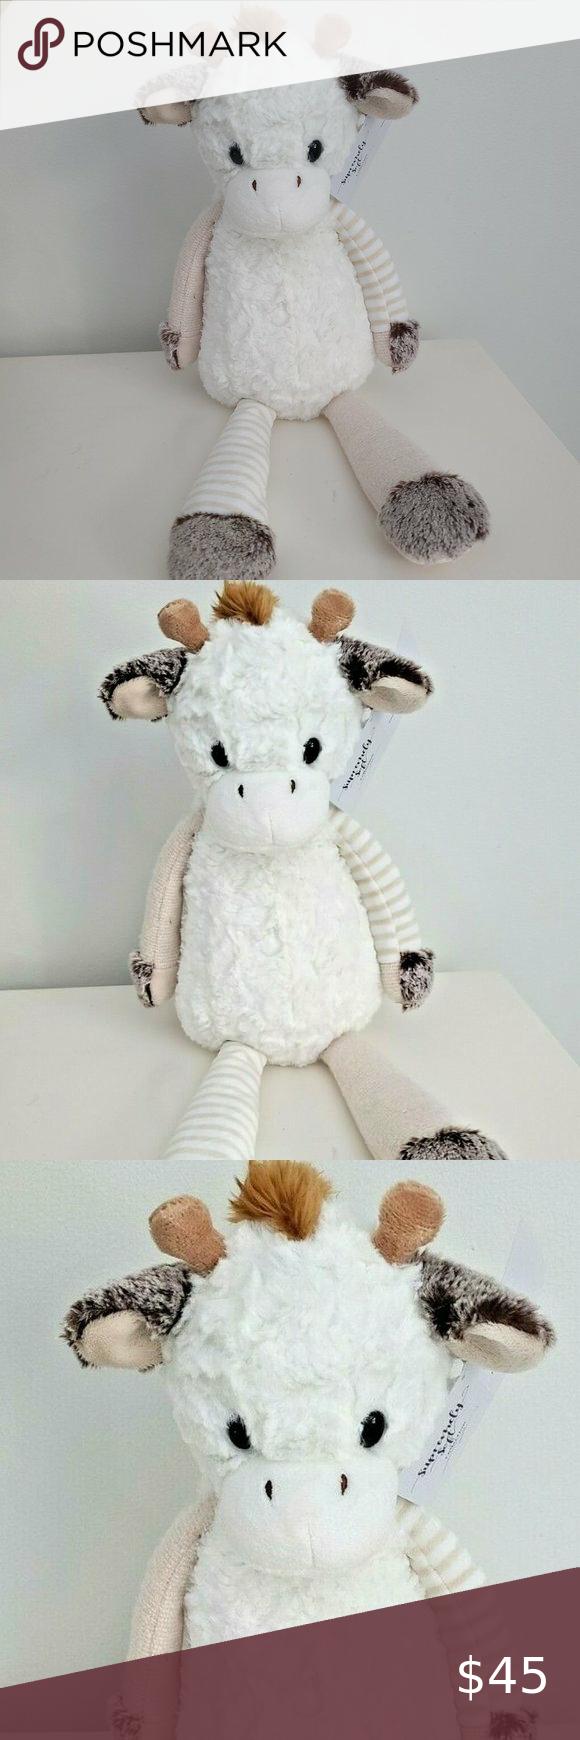 Predownload: Aurora World Purely Luxe Giraffe Stuffed Animal In 2021 Giraffe Stuffed Animal Soft Toy Animals Animal Babies Toys [ 1740 x 580 Pixel ]